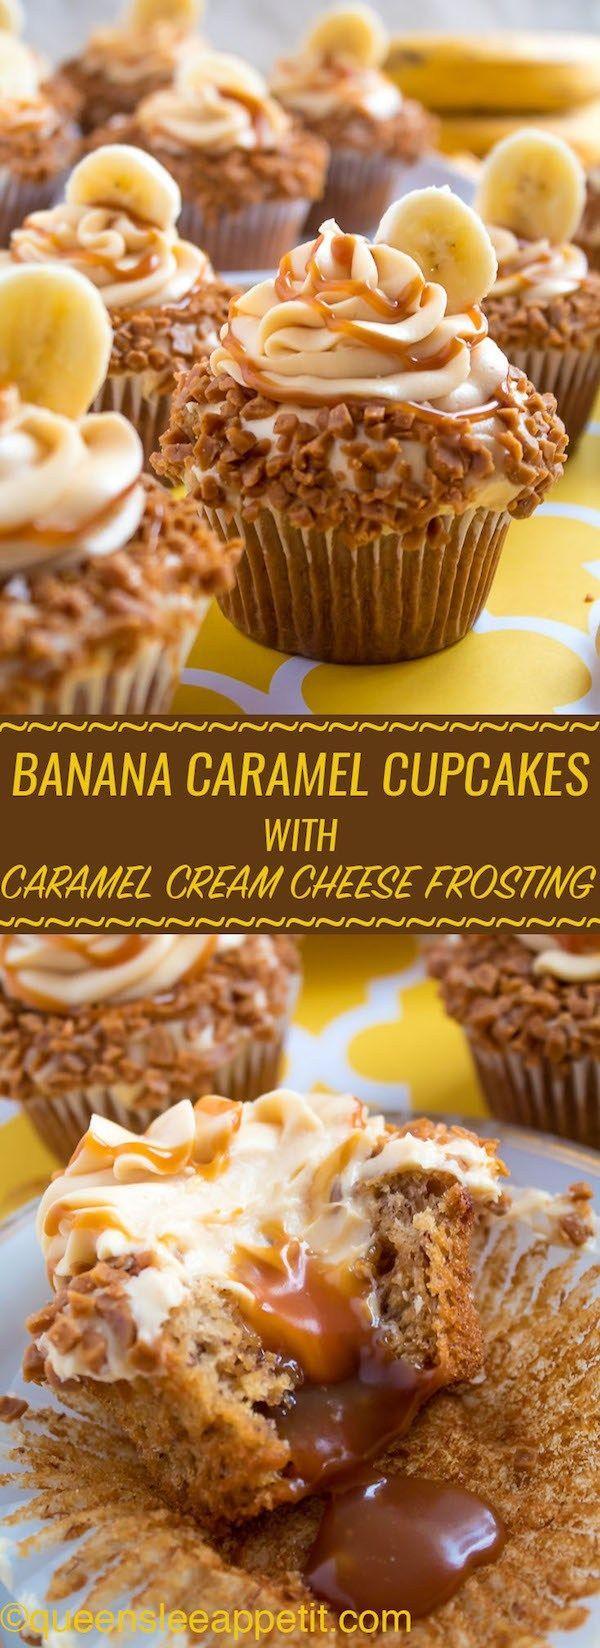 Photo of Banana and caramel cupcakes with caramel cream cheese ~ recipe